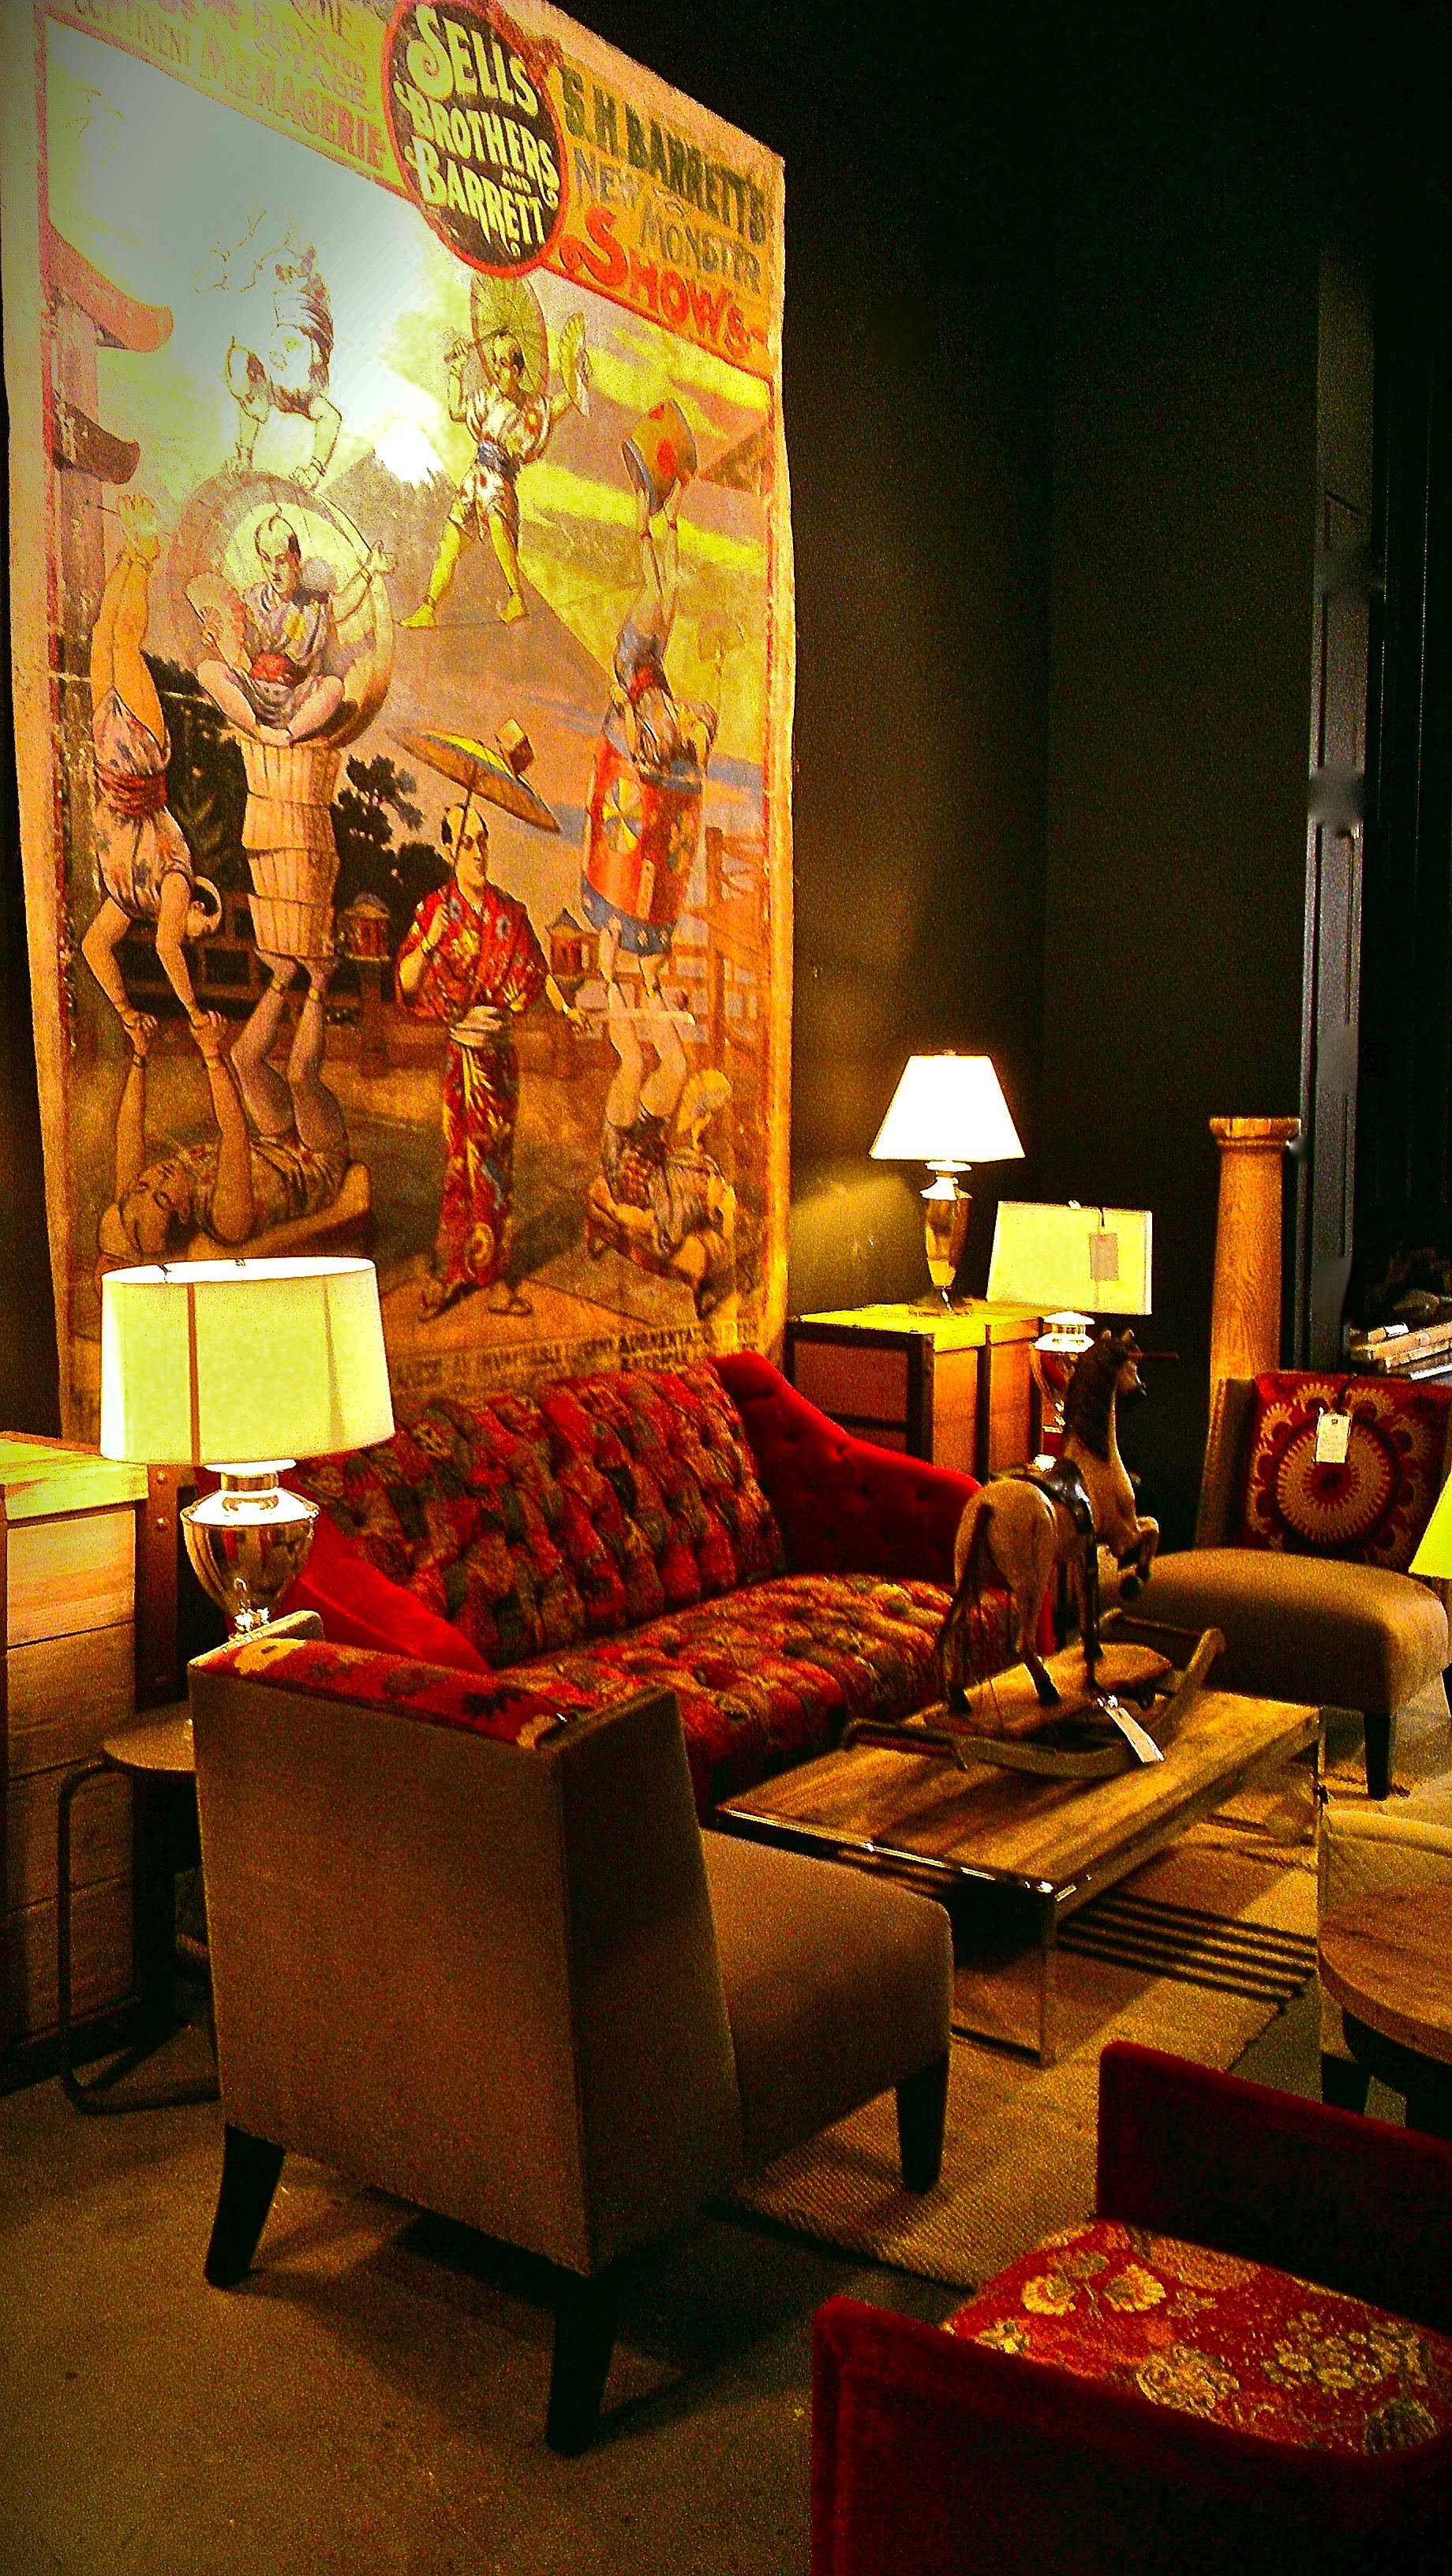 Vintage Circus Canvas reproduction, Tagara Sofa in